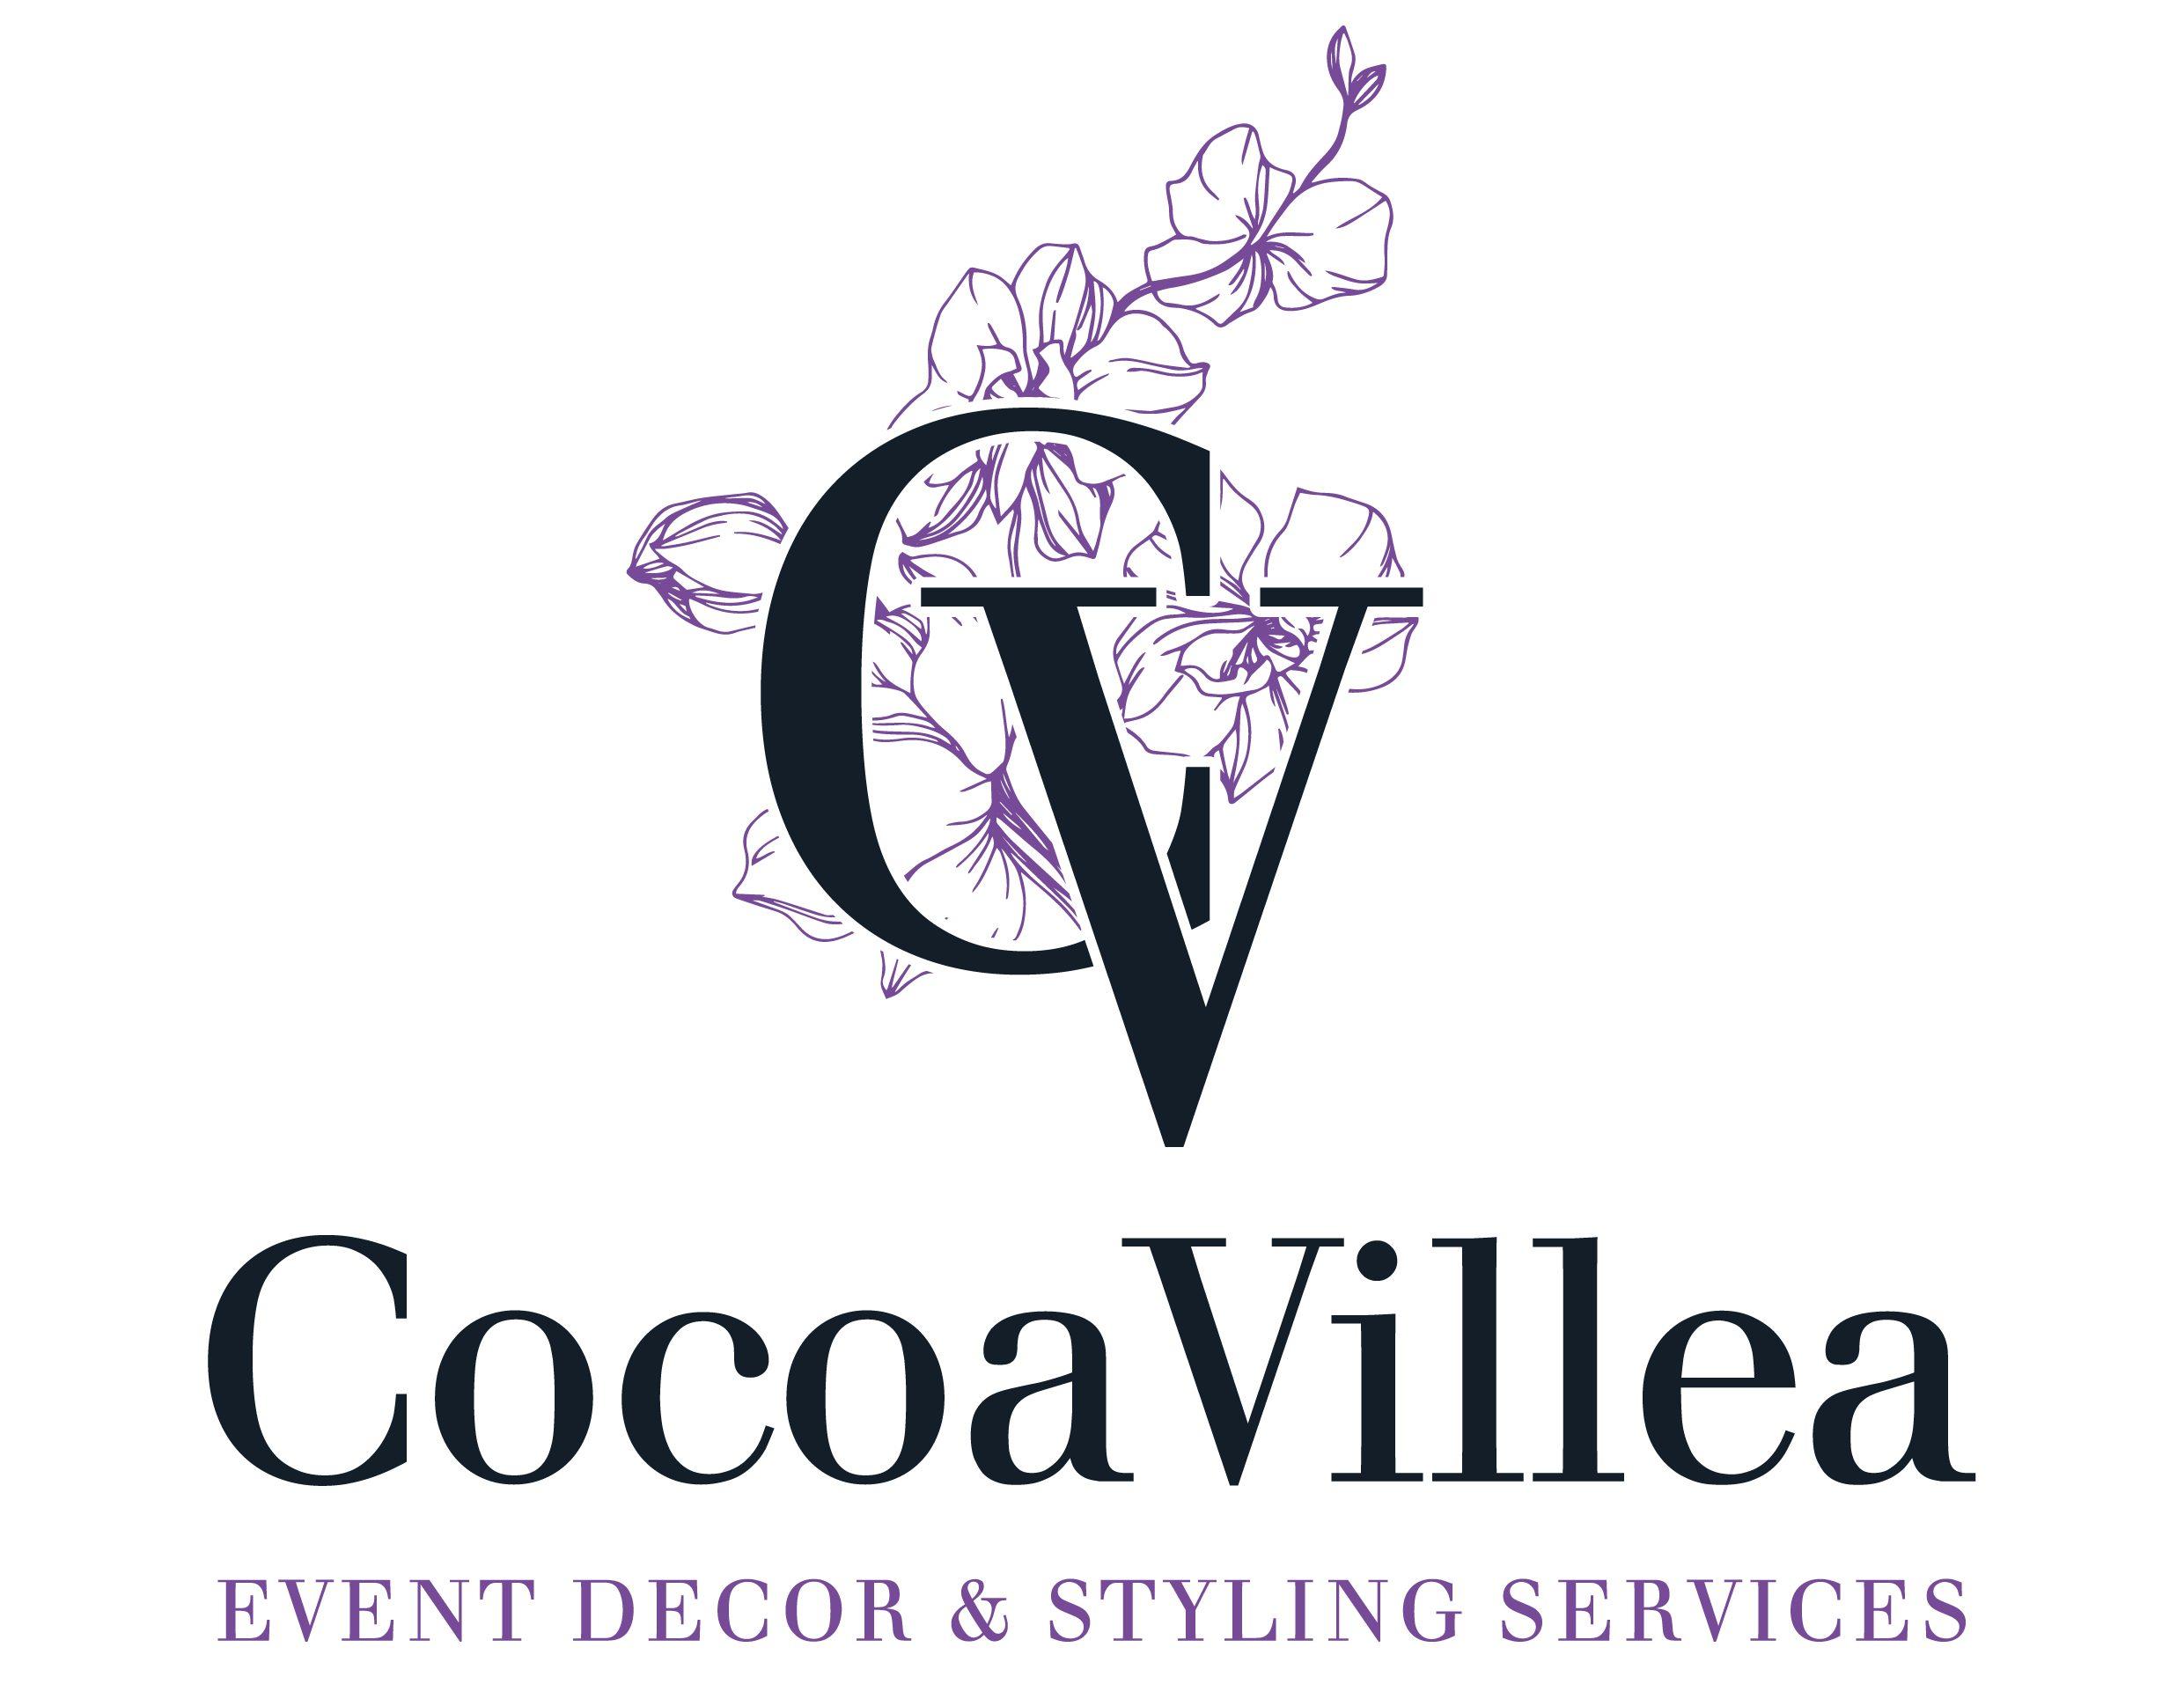 Cocoa Villea